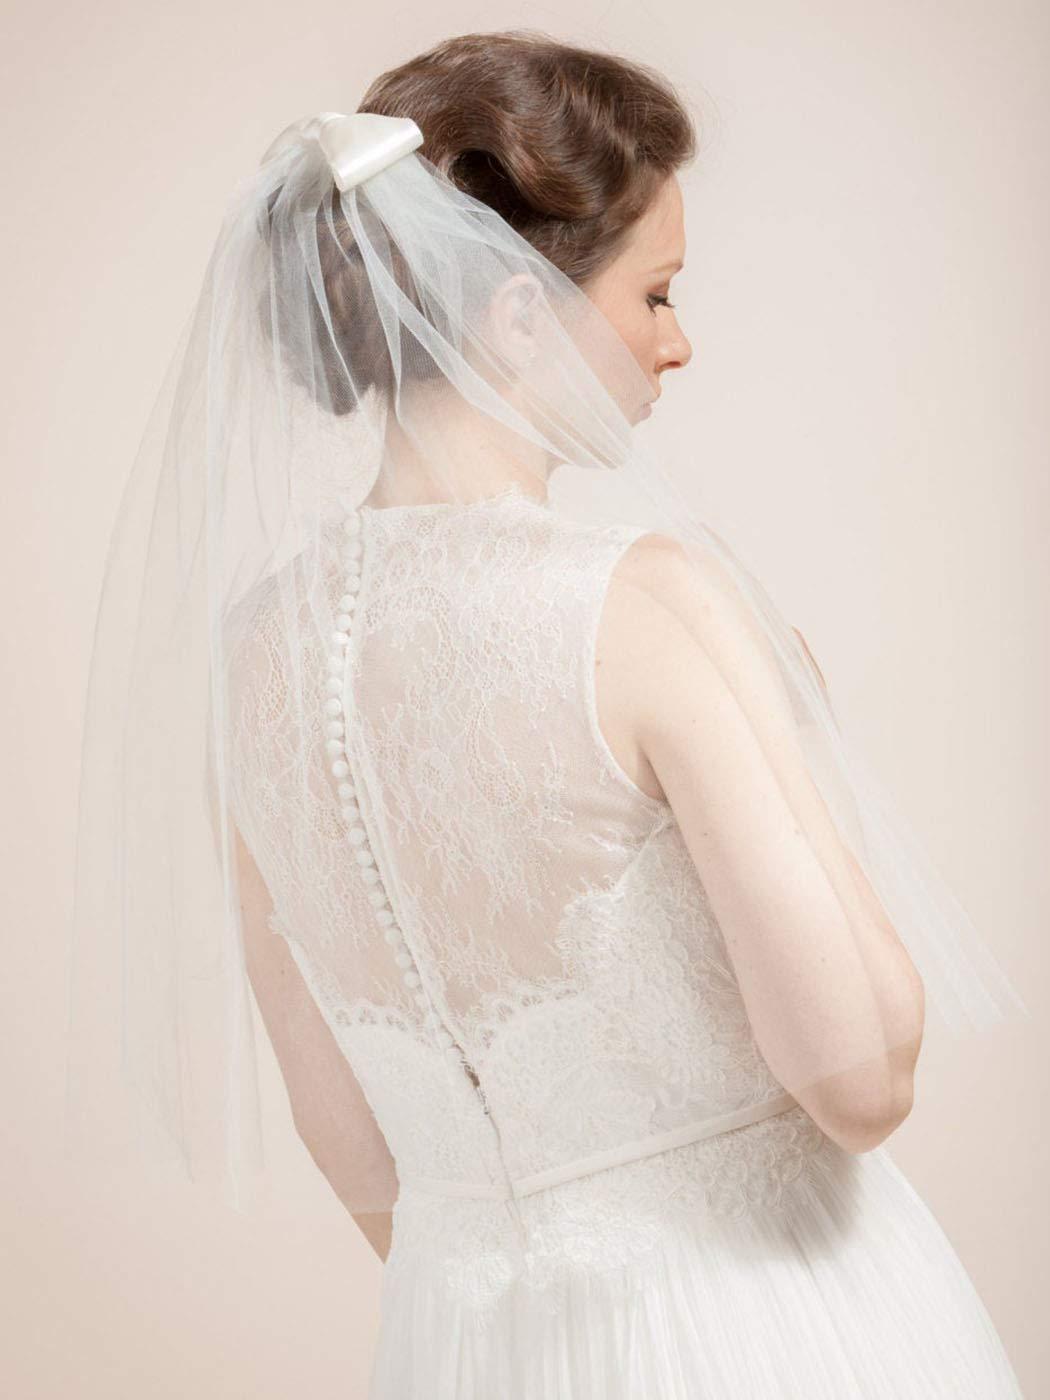 Yokawe Women's Bridal Wedding Veil 2 Tier Bow Bride Veils with Comb White Wedding Headpiece (White)